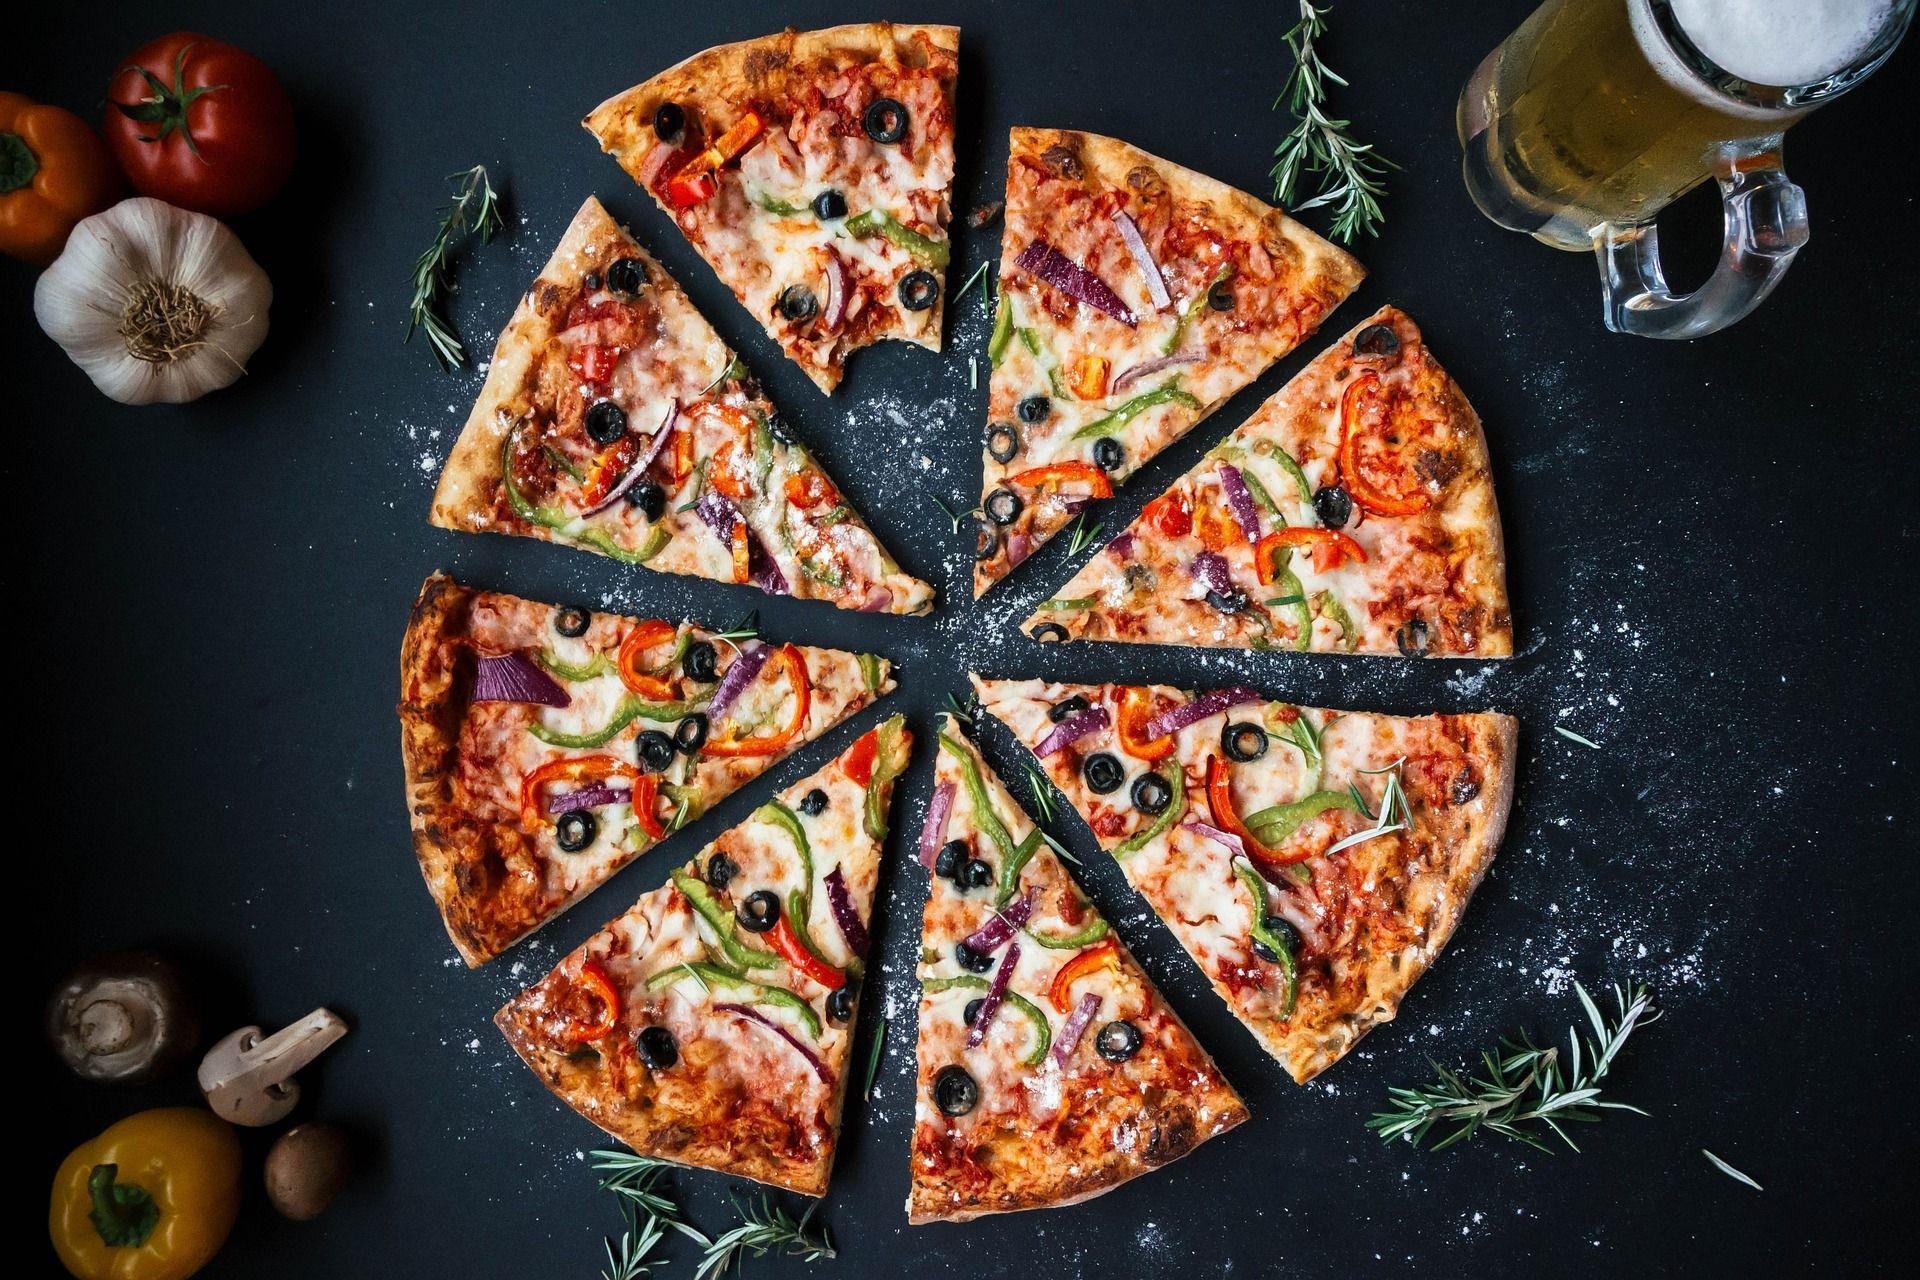 Foto 3 de Pizzerías en  | Barocchetto, il Ristorante Pizzería